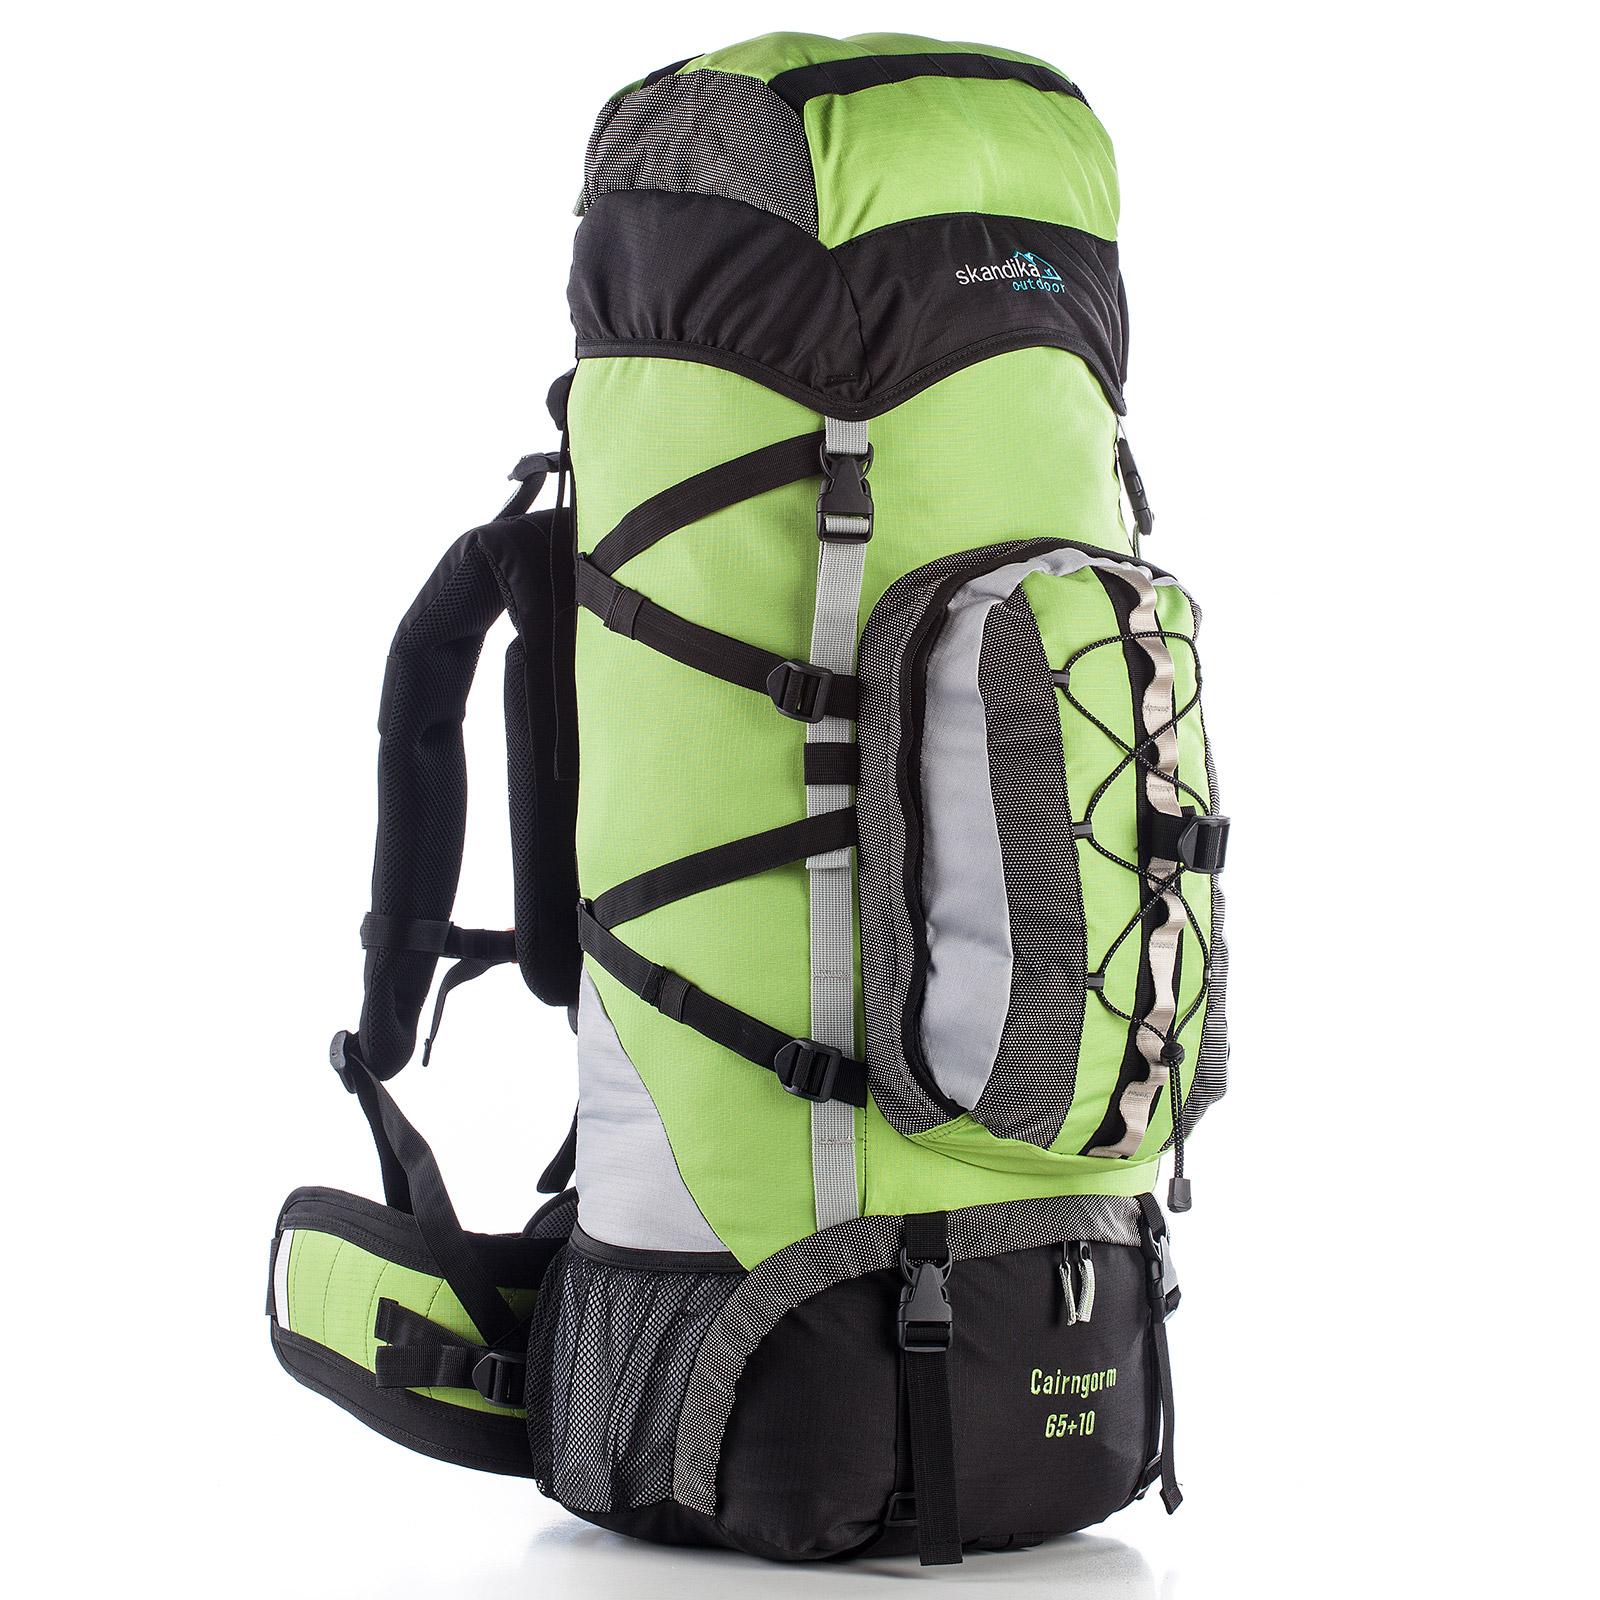 skandika trekking rucksack sporttasche freizeitrucksack reiserucksack hiking neu ebay. Black Bedroom Furniture Sets. Home Design Ideas